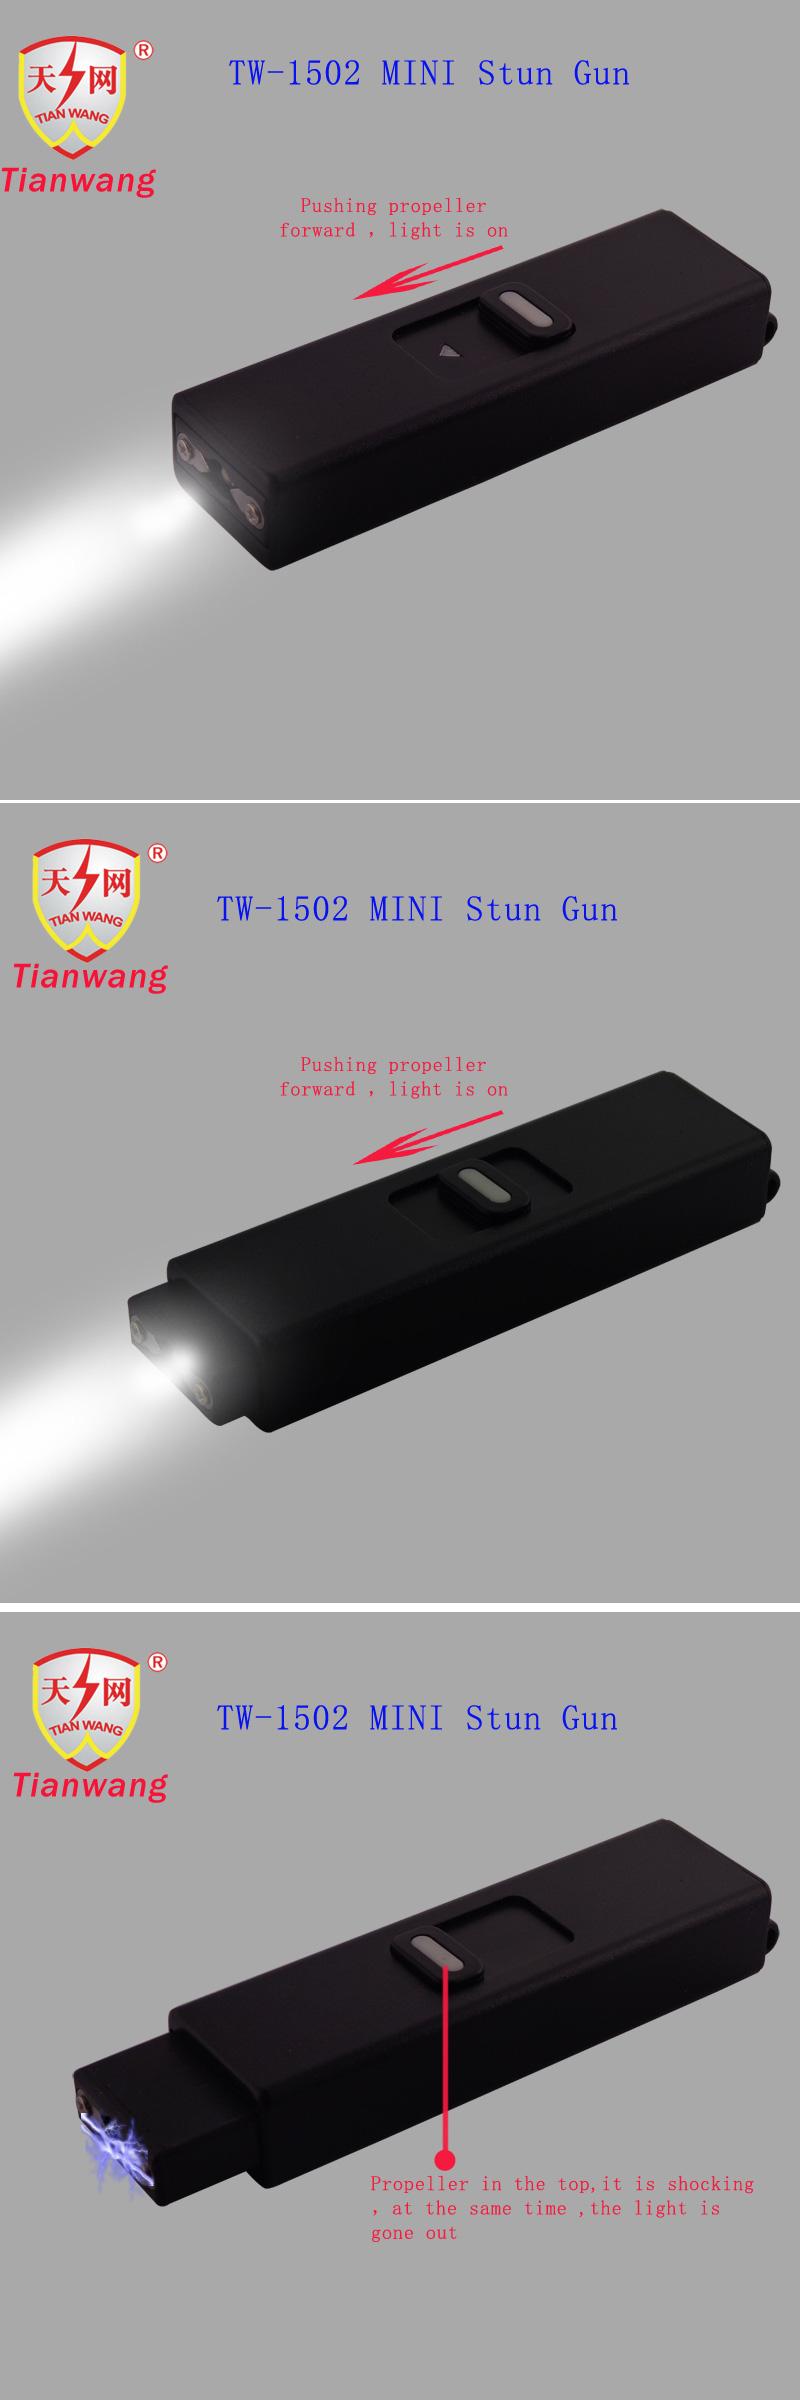 Self Defense Keychain Stun Gun with Flashlight